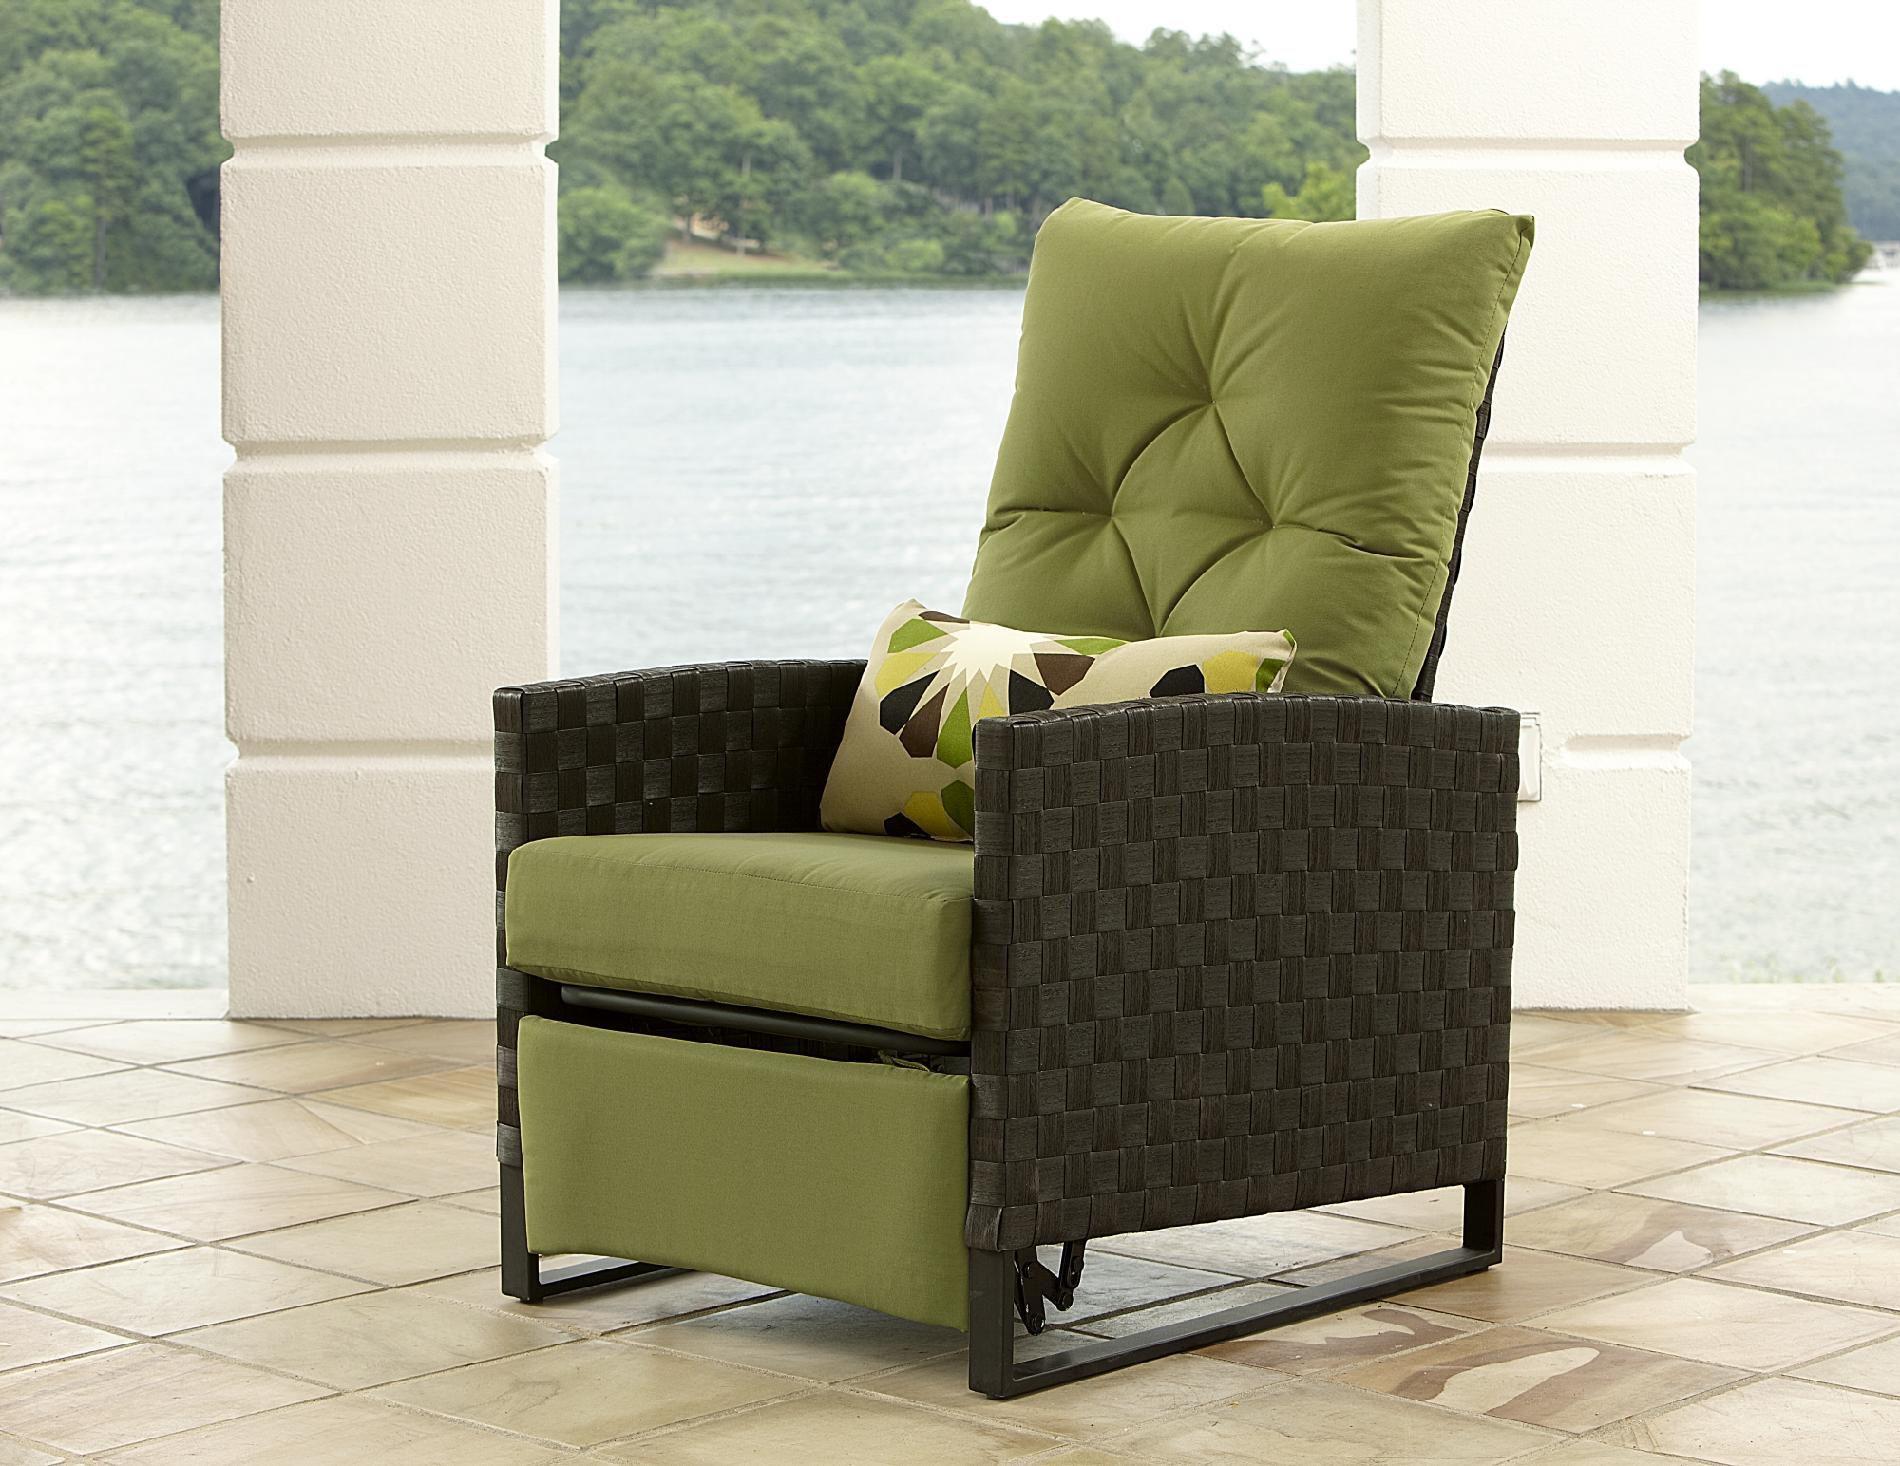 La Z Boy Outdoor Karson Recliner   Outdoor Living   Patio Furniture   Chairs